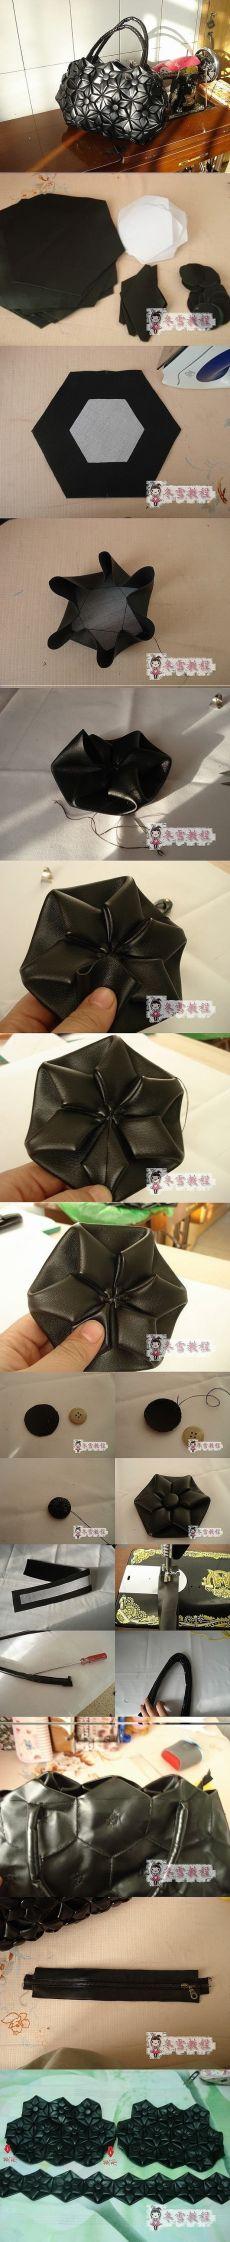 bolso de cuero de origami (Bricolaje) / bolsos, embragues, bolsas / segunda calle